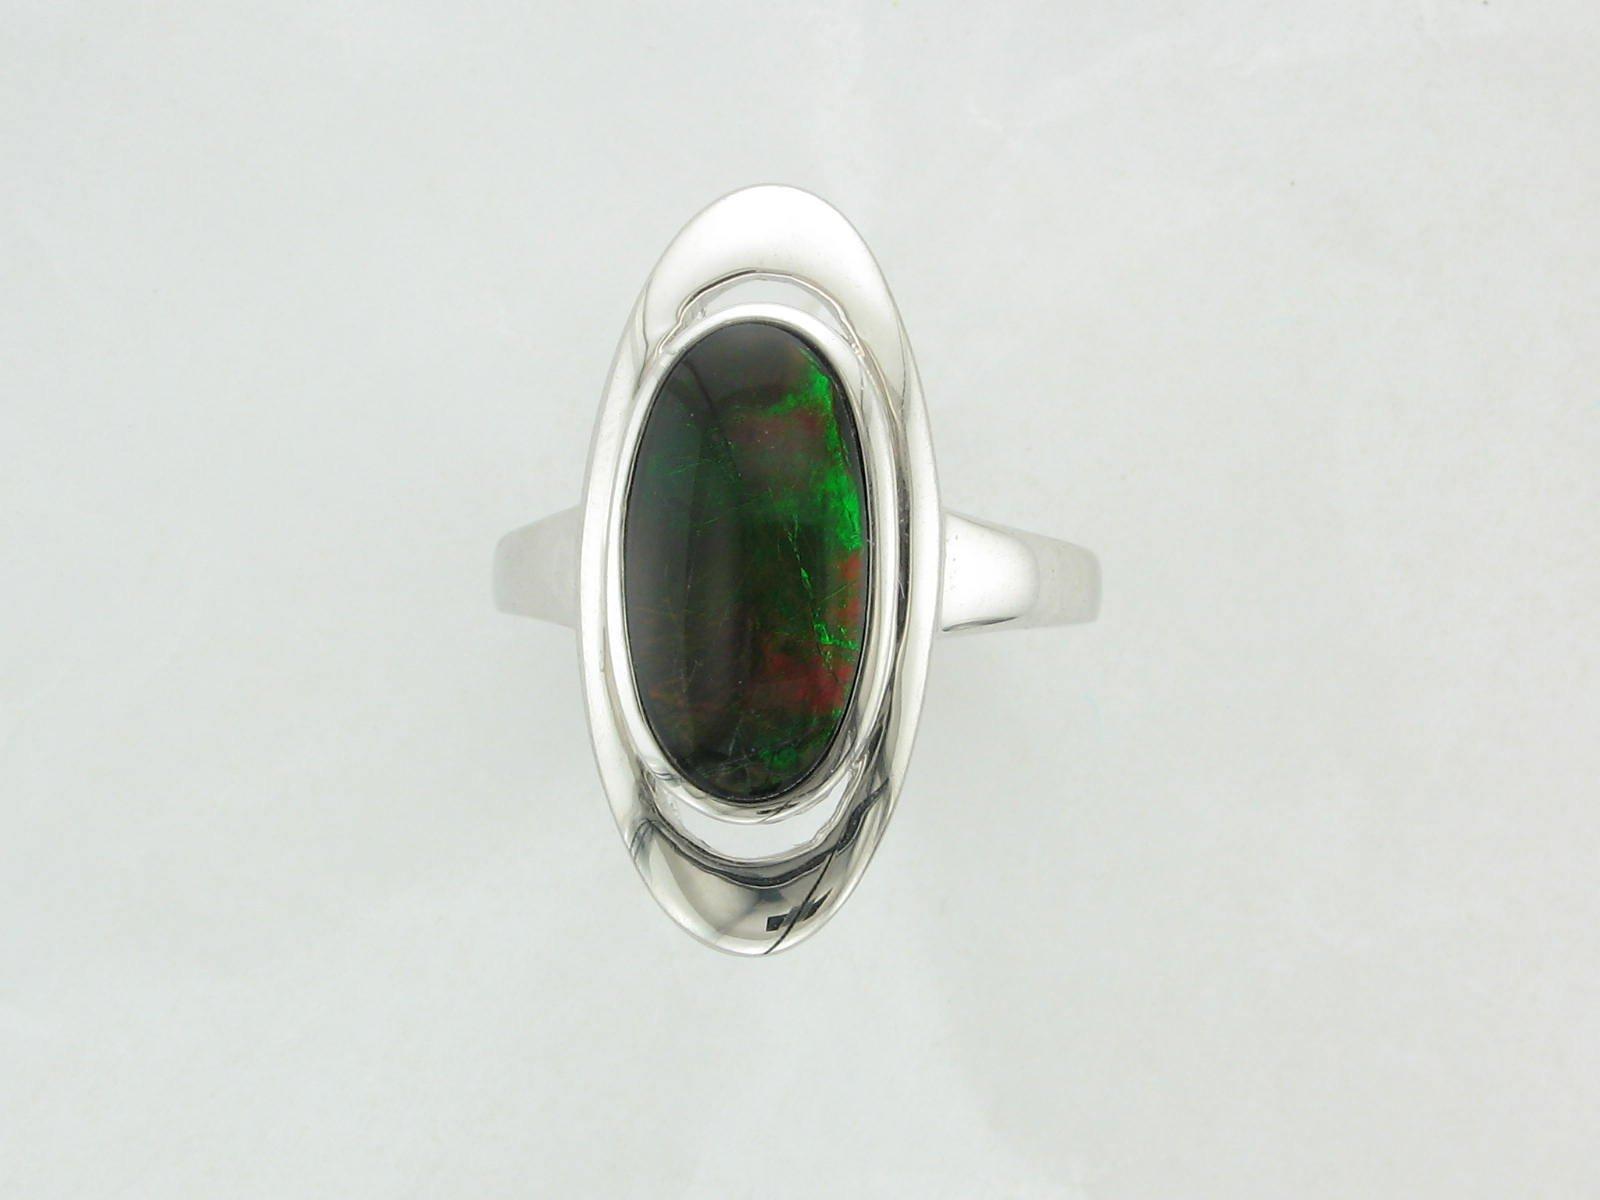 Standard Grade Ammolite Elongated Oval Ring set in Sterling Silver